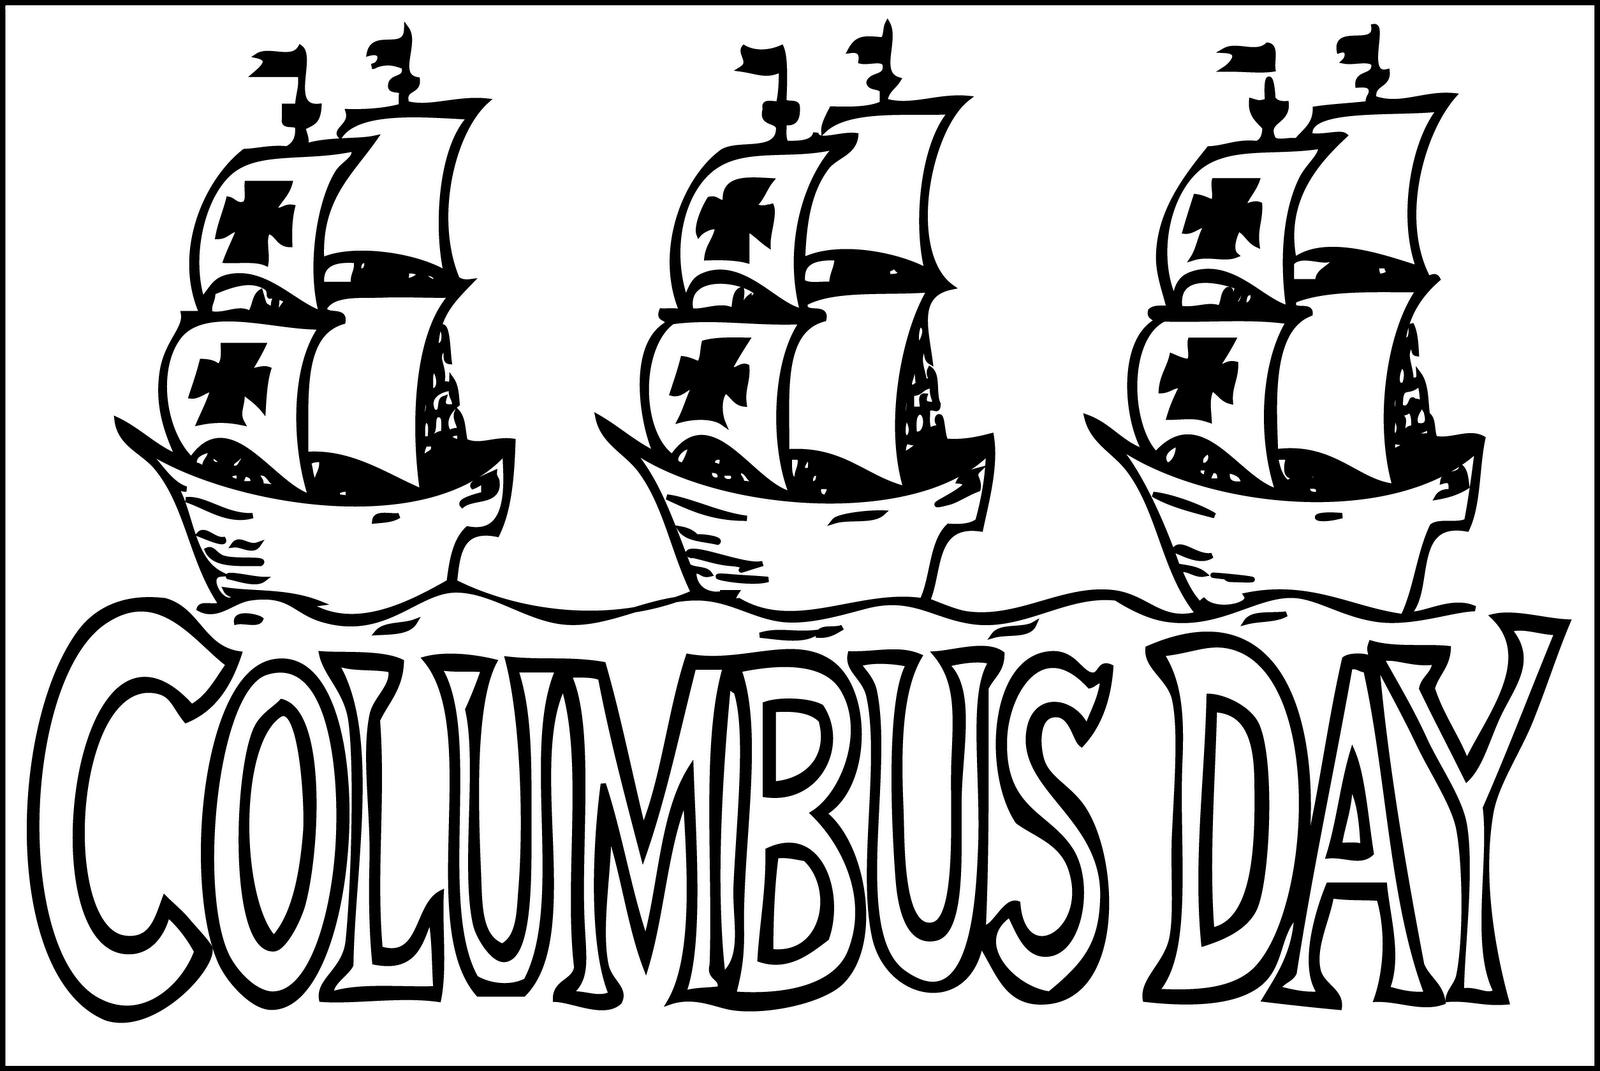 Columbus Day Schedule 10 08 12